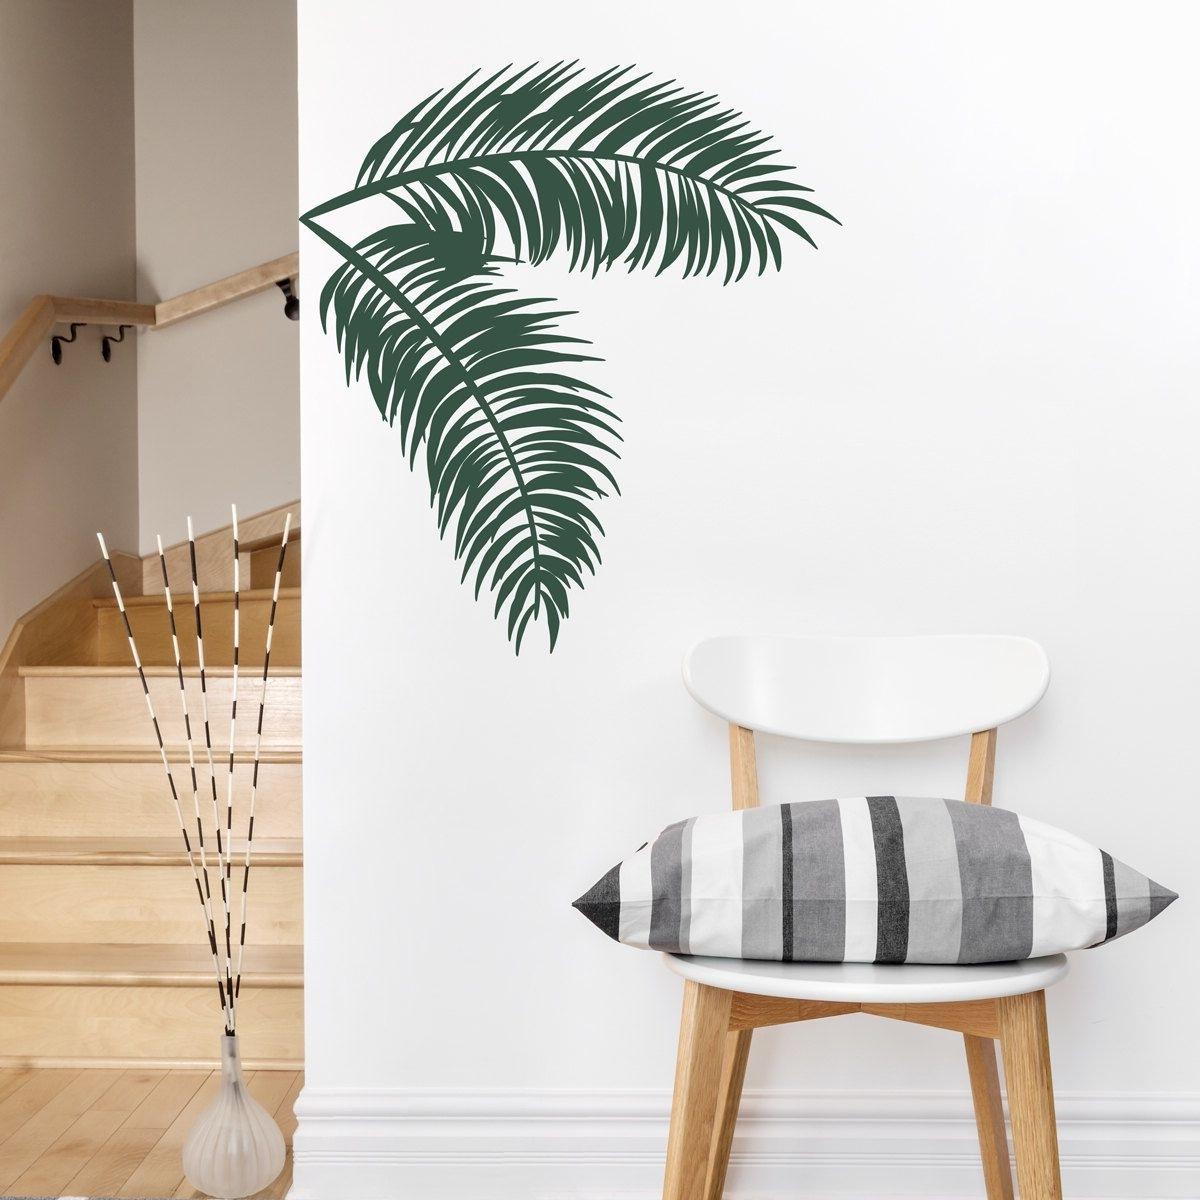 Palm Leaves Wall Decal  Tropical Wall Art, Palm Tree Decal, Hawaiian Inside Well Liked Palm Tree Wall Art (View 9 of 15)